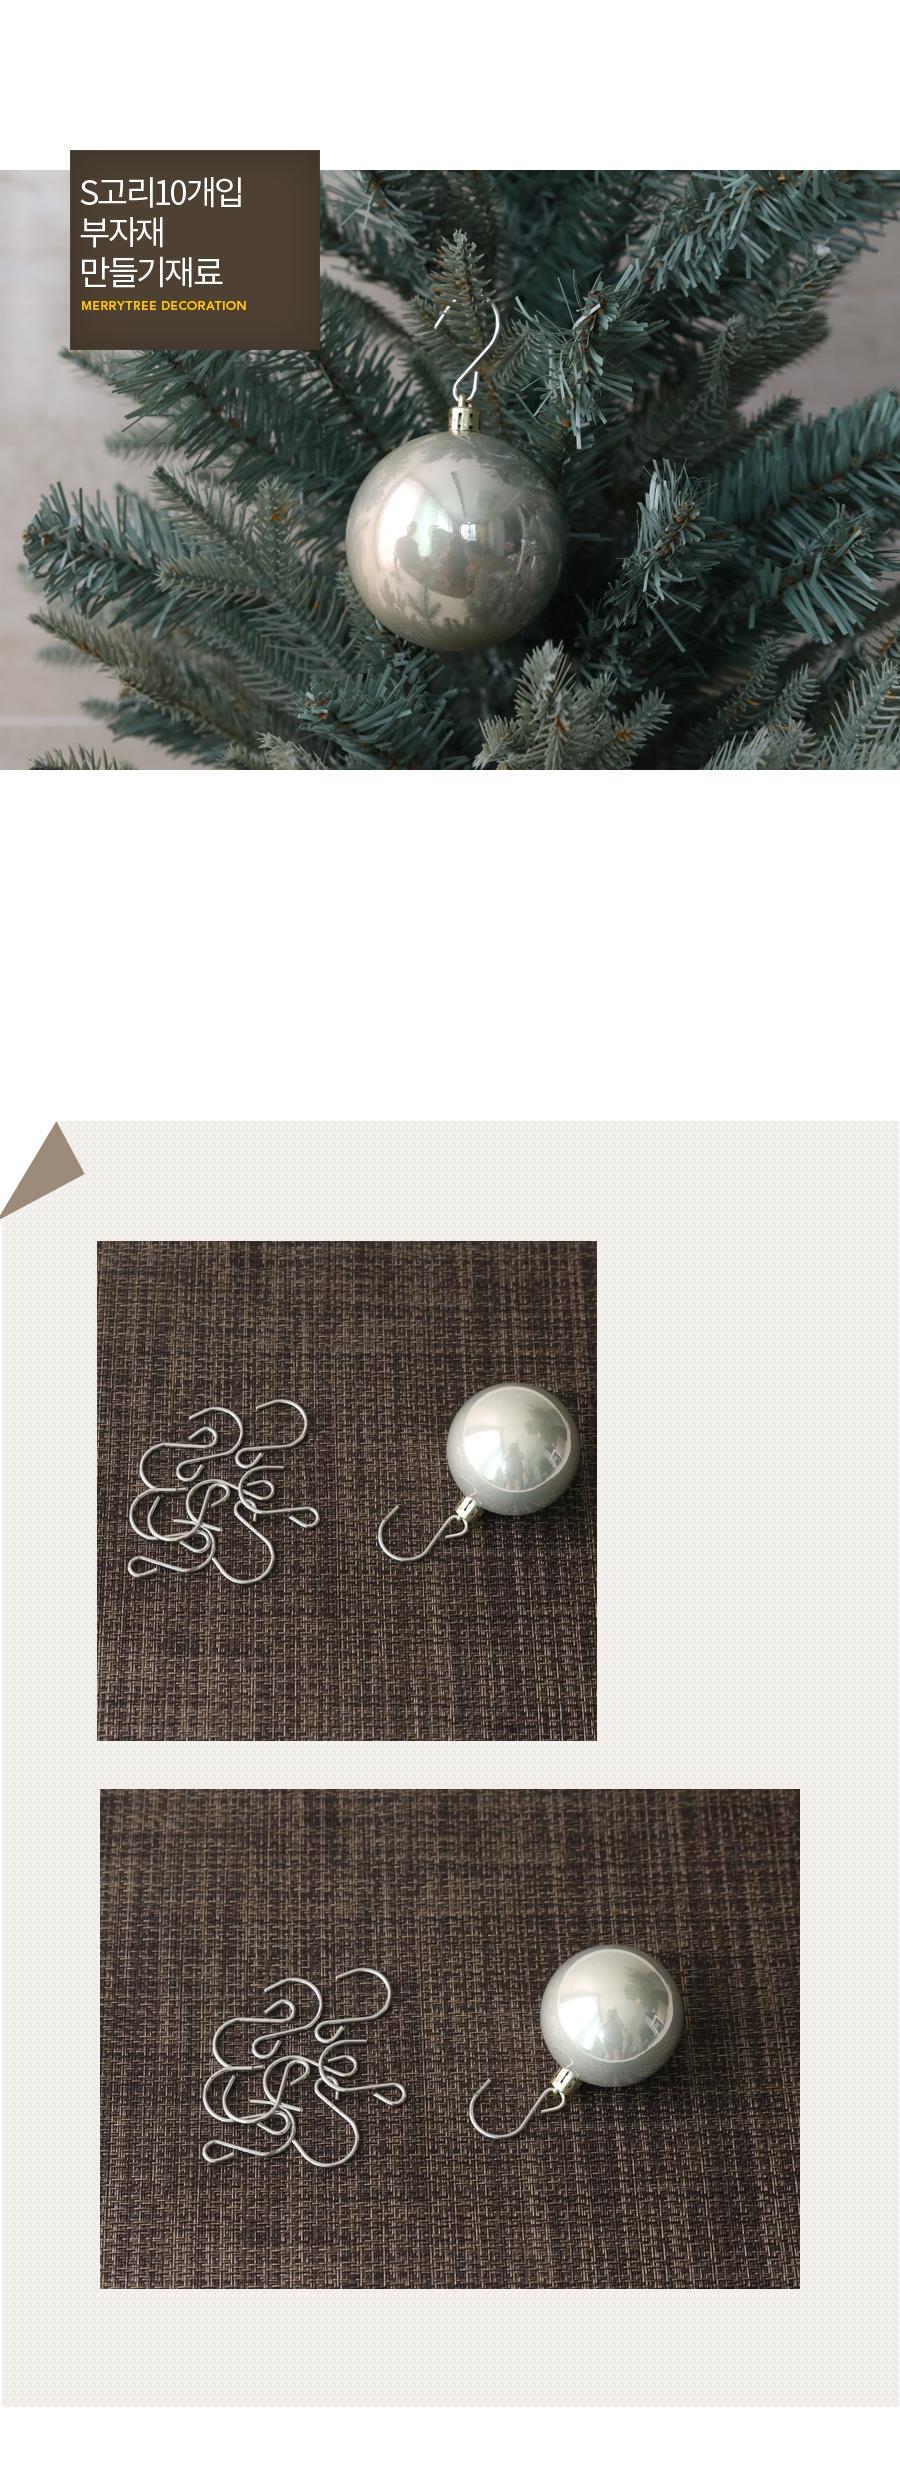 Hm7901 S고리10개입 부자재 재료 - 메리트리, 900원, 장식품, 크리스마스소품